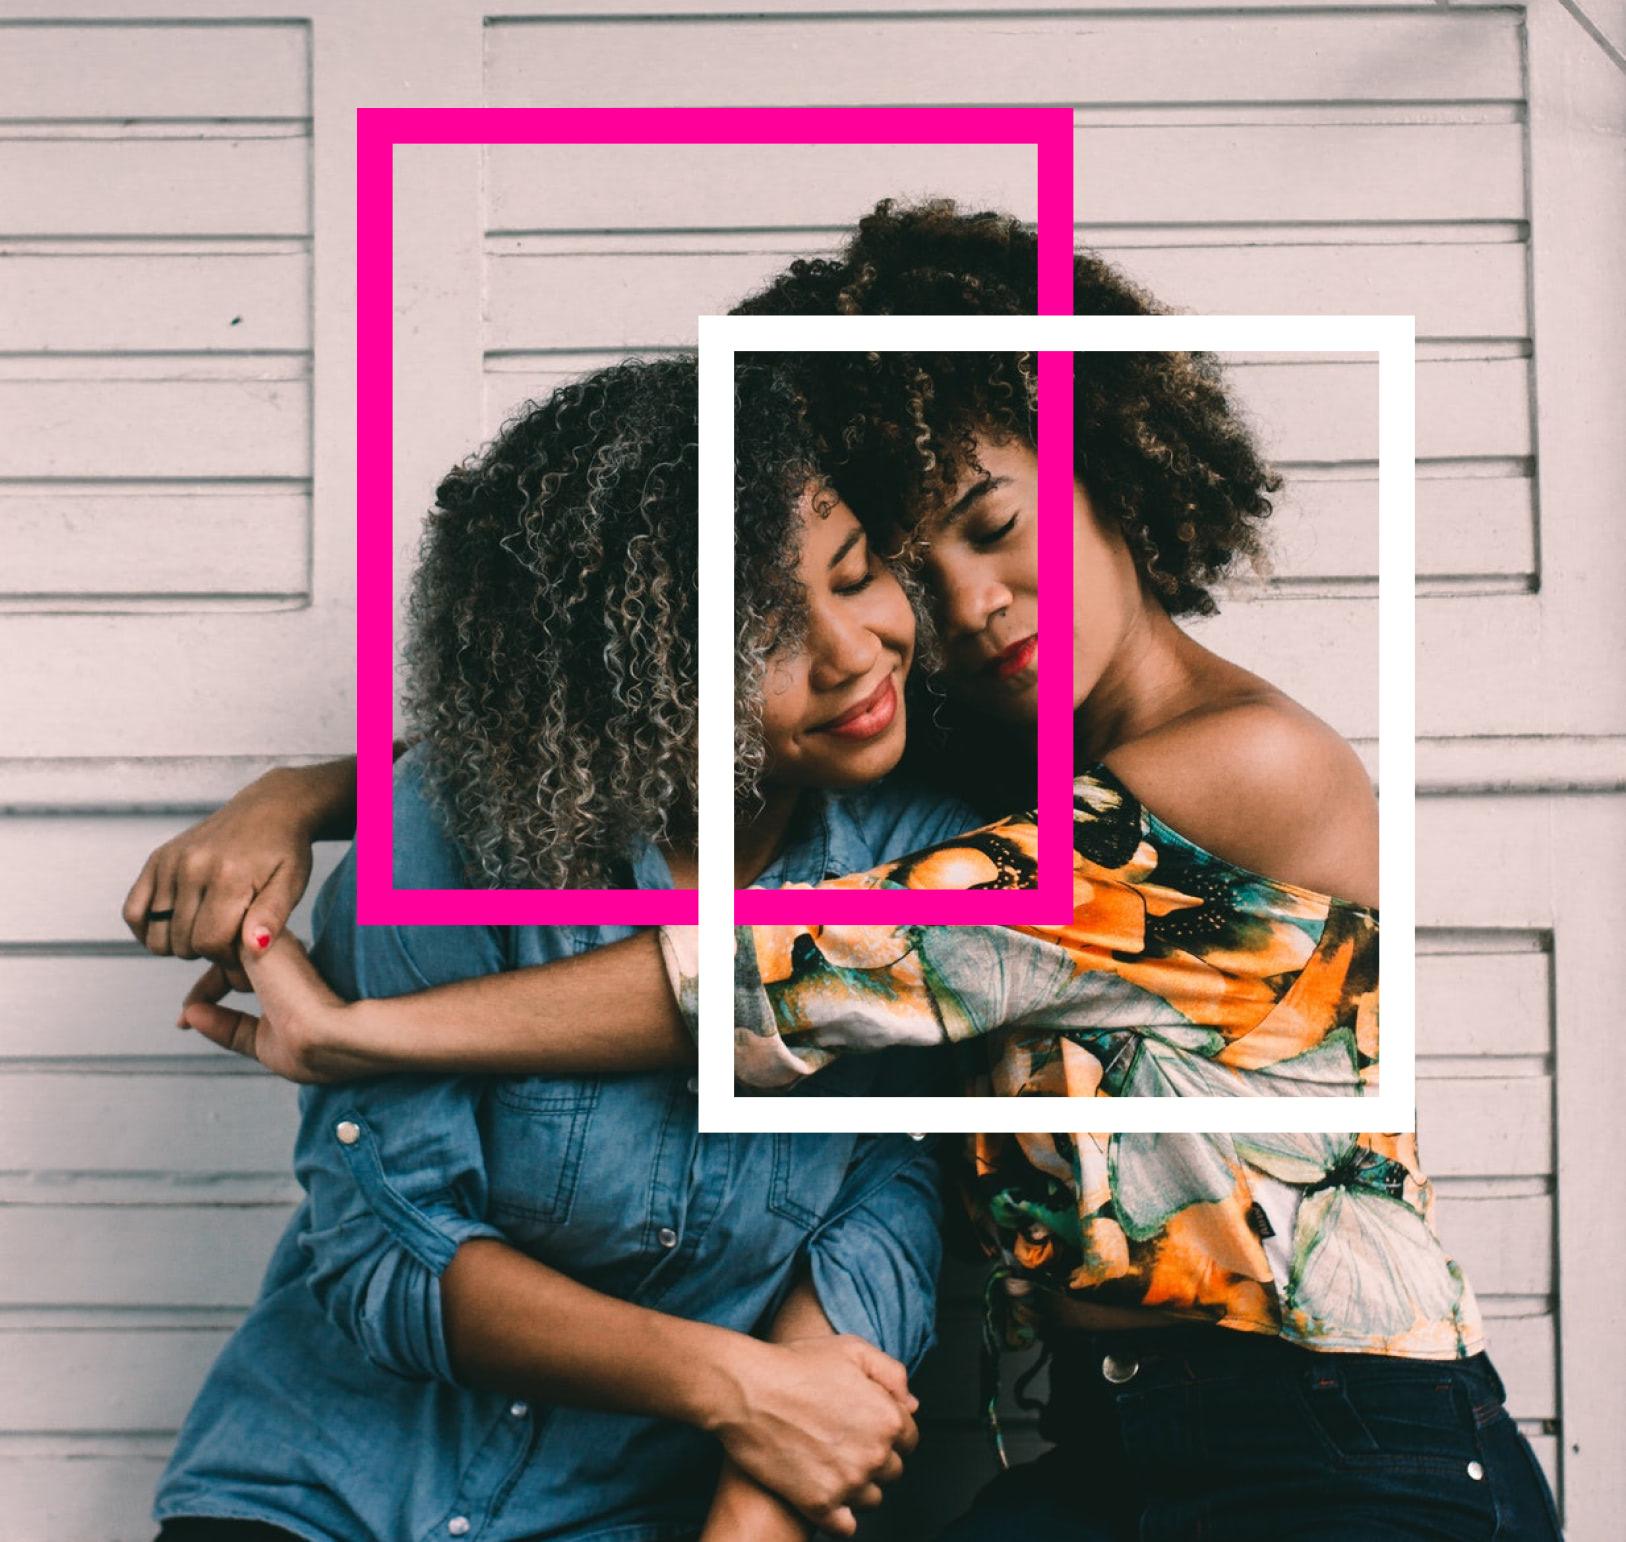 LGBTQ+ dating app for Christians